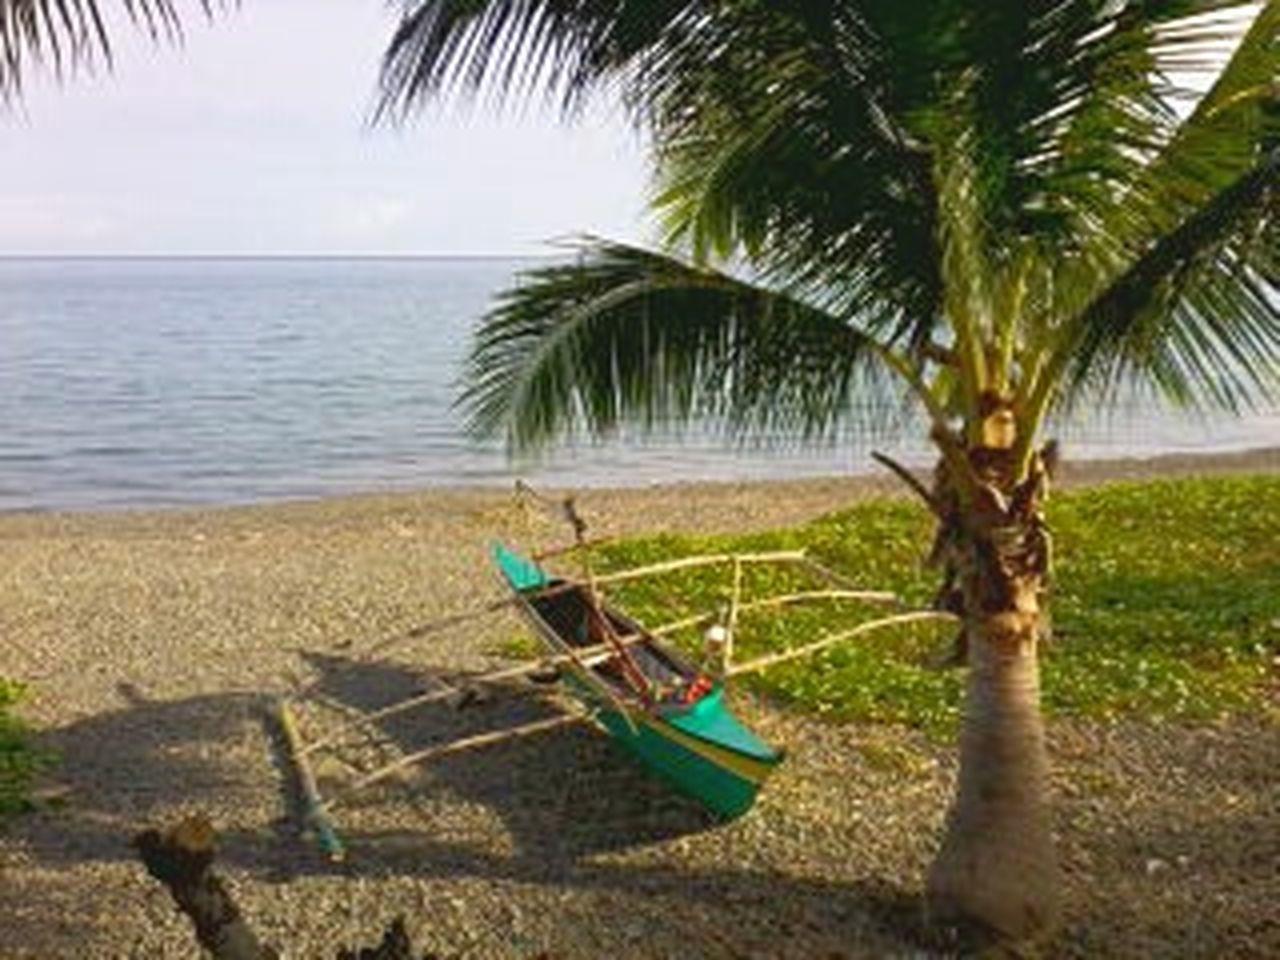 Summer breeze. Beach Beauty In Nature TravelPhilippines Bicol, Philippines Tranquility 5th Eyeem Photo Travelasia Pilipinas Bakasyon Palmtree